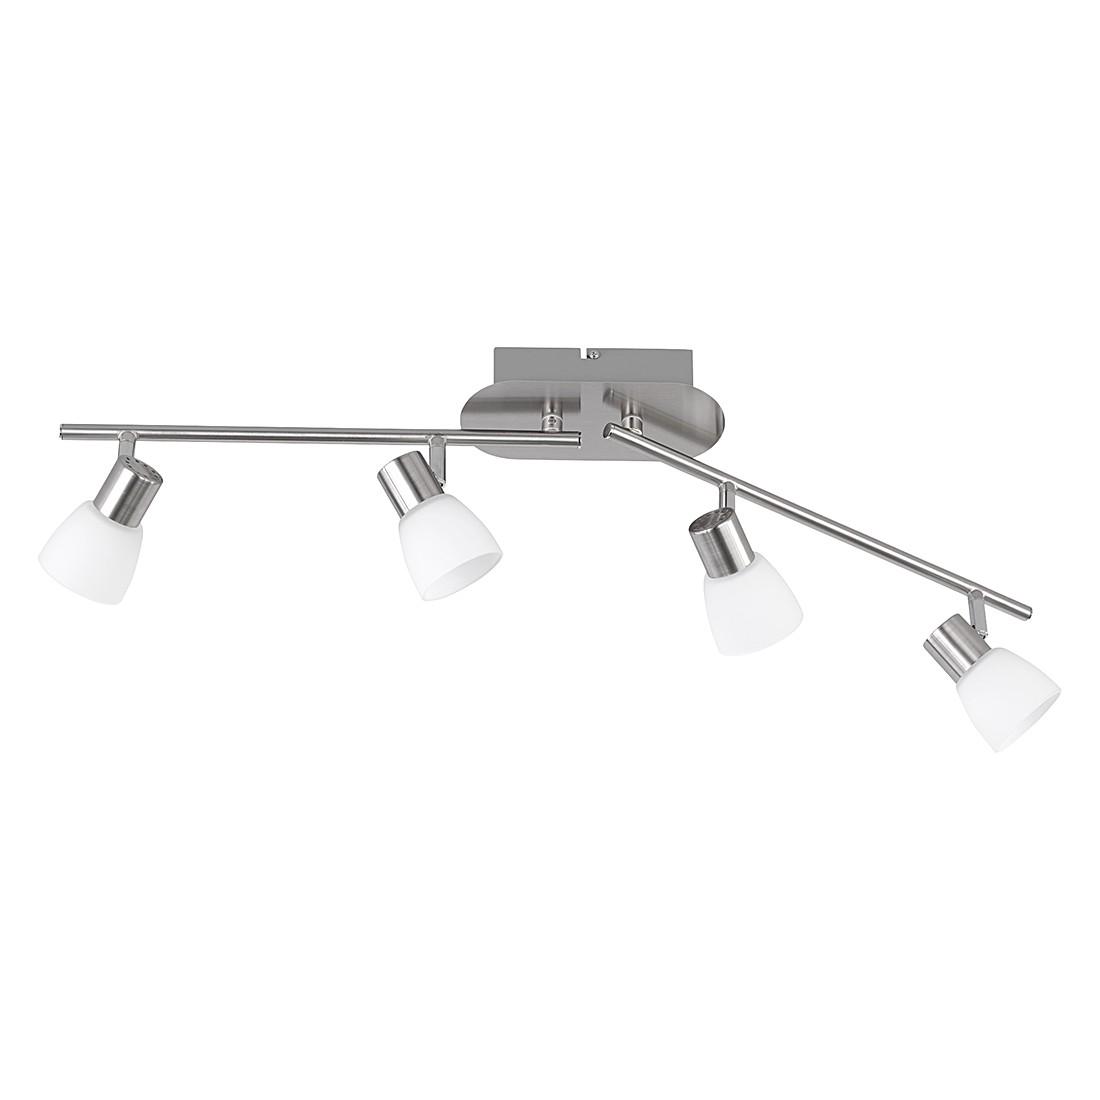 EEK A+, Luminaire LED - Nickel 4 x 4,5 watts, Trio